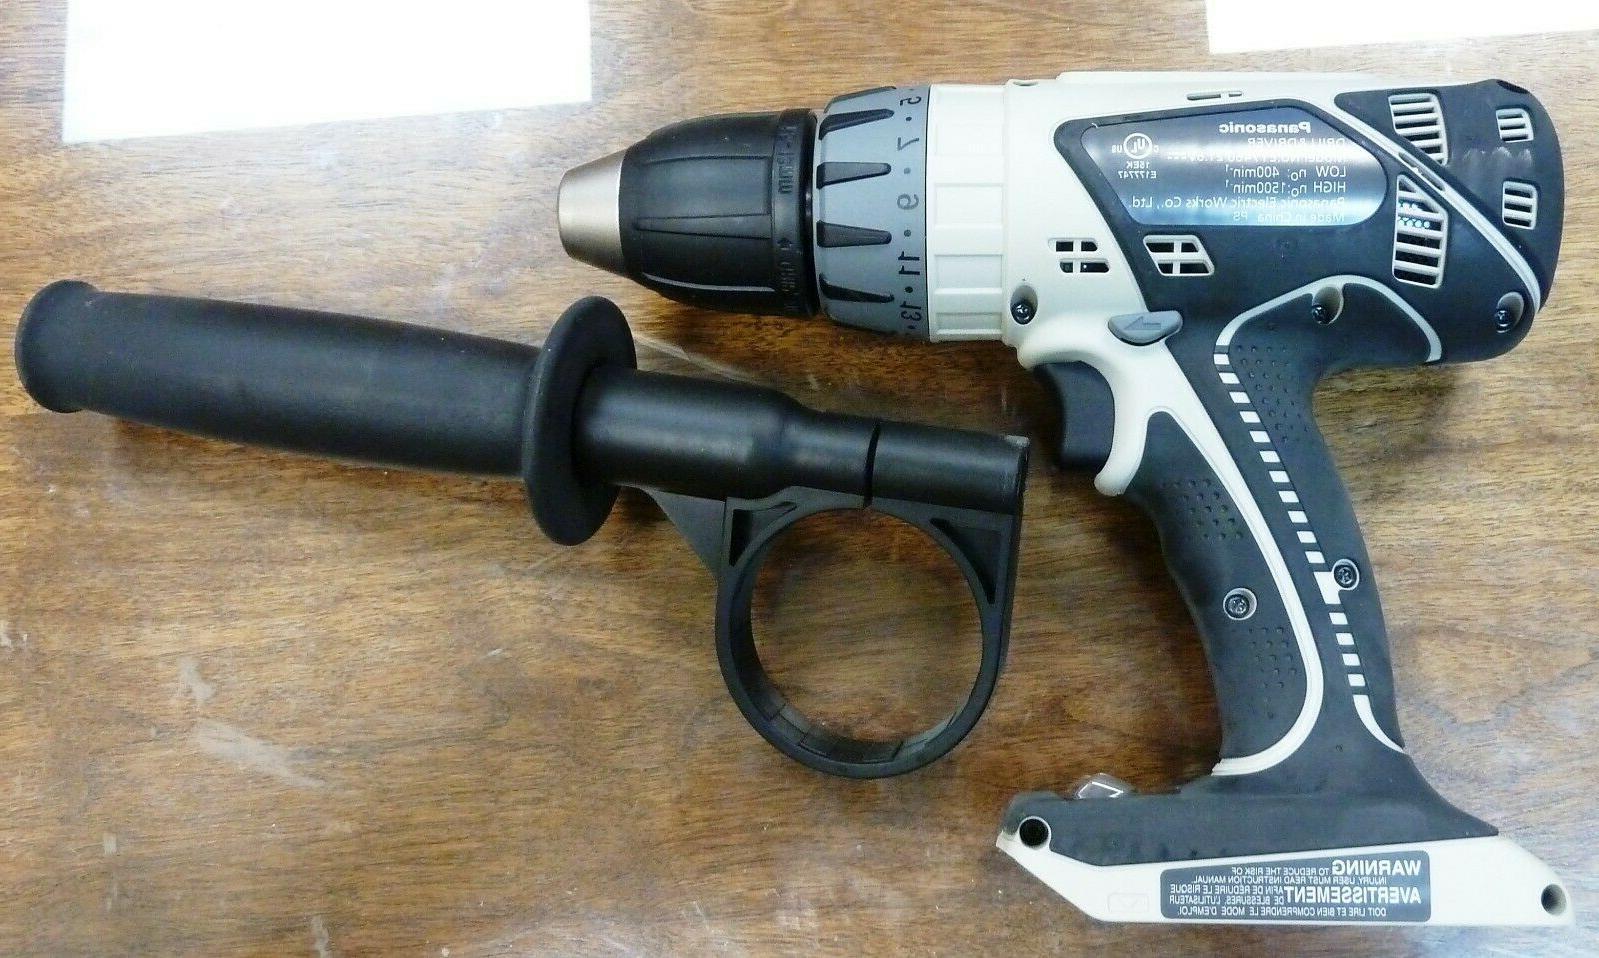 ey7460 x 21 6v cordless drill driver